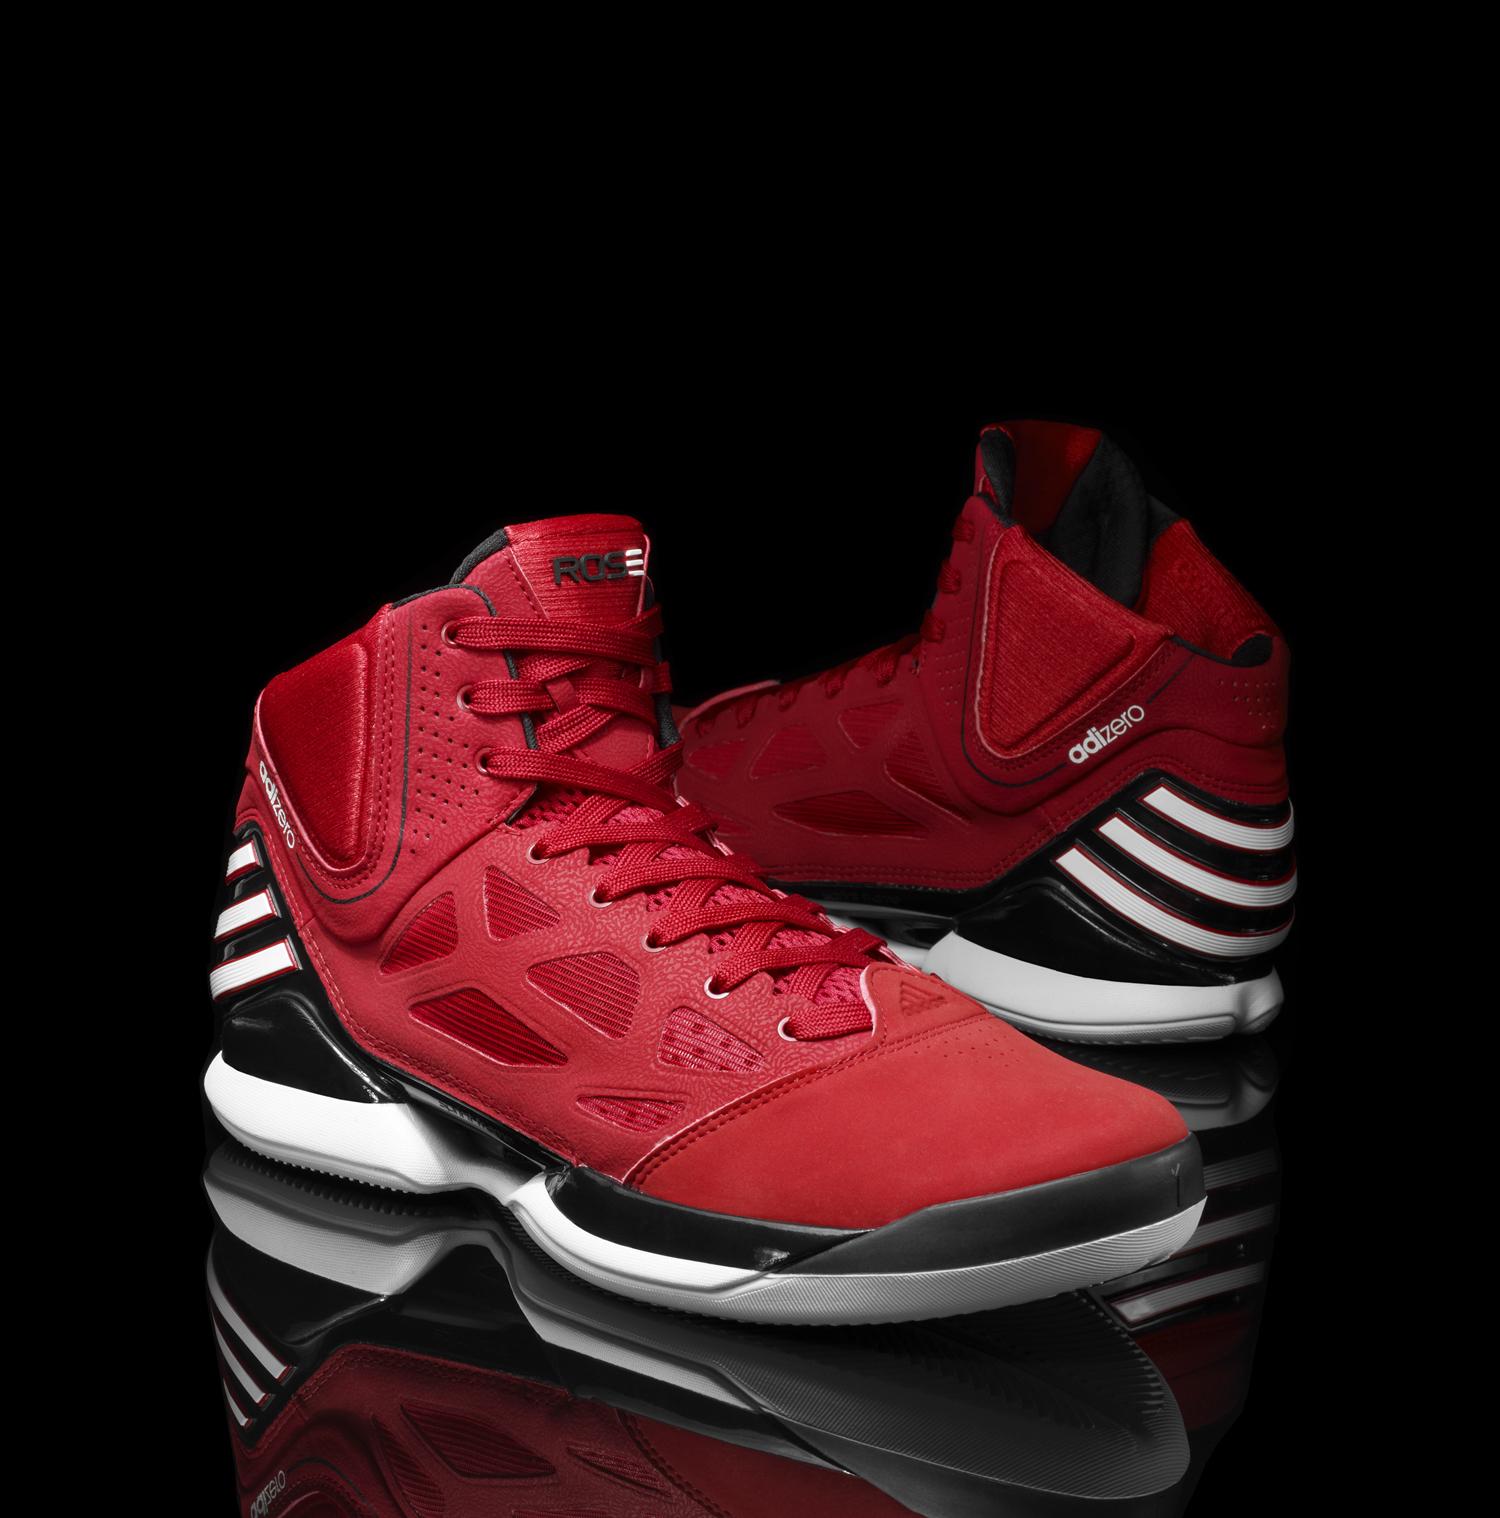 derrick rose shoes adizero 3 - photo #43